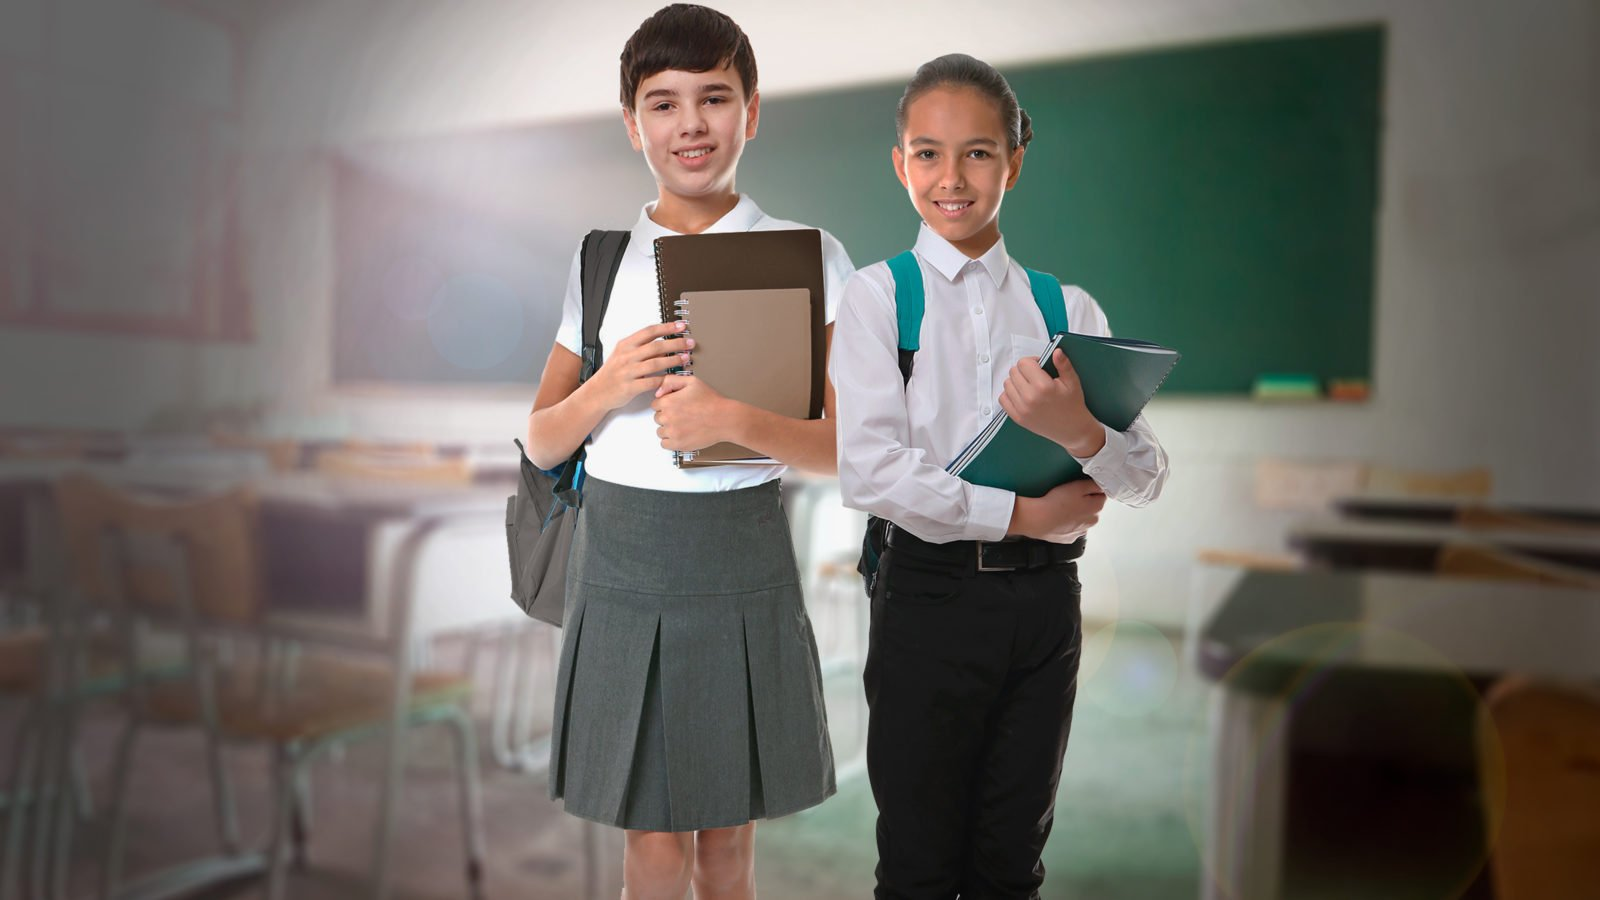 Uniforme escolar neutro